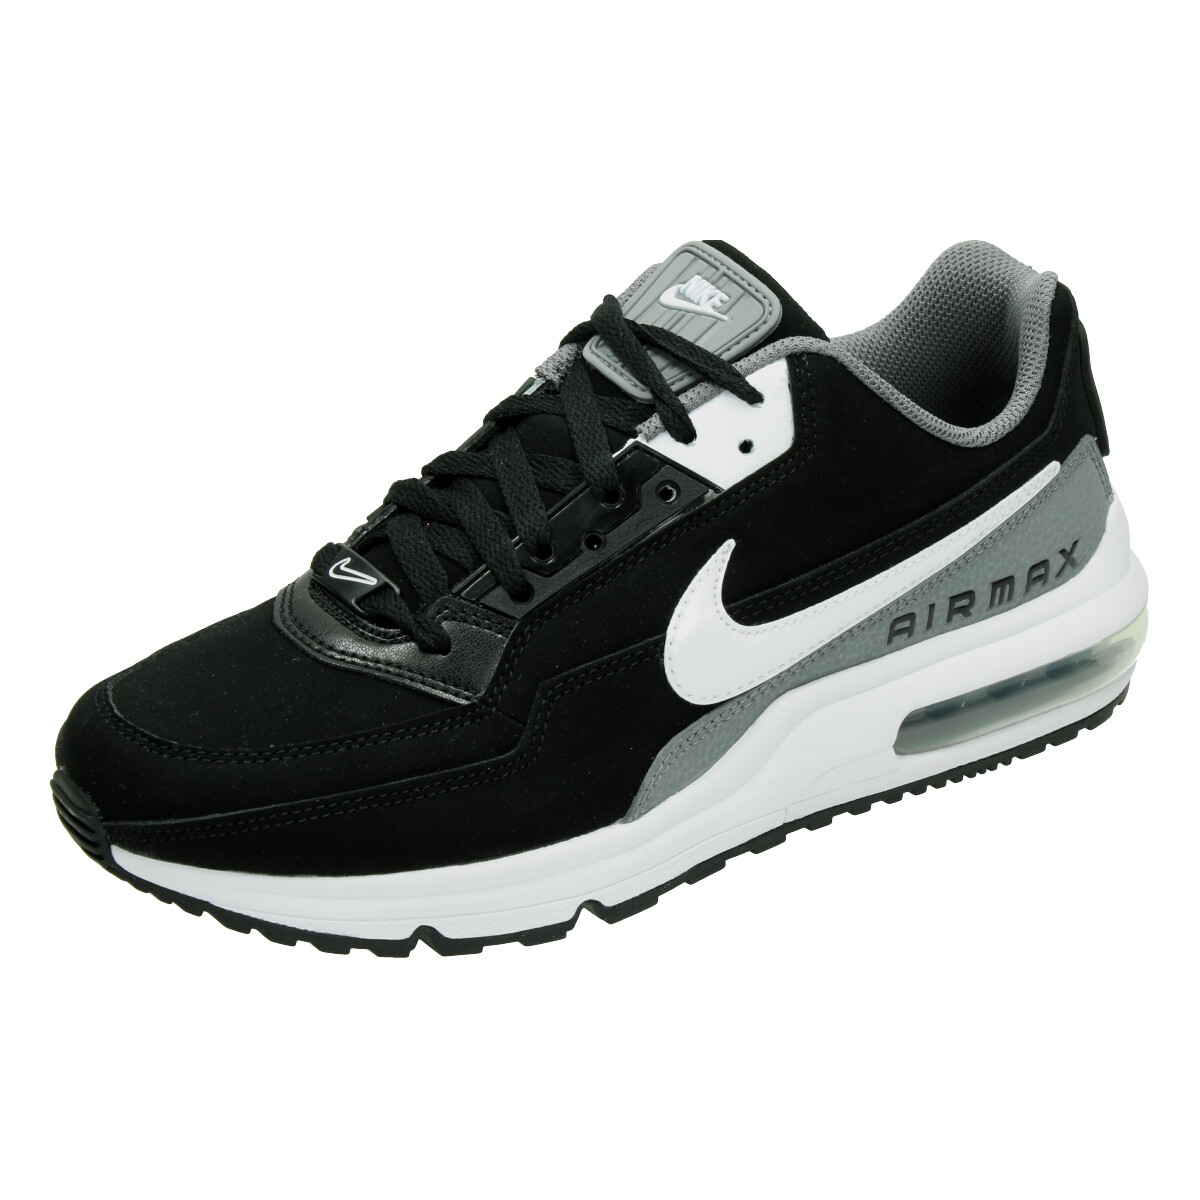 AIR MAX LTD 2 zwart,nike air max amsterdam,nike sneakers air